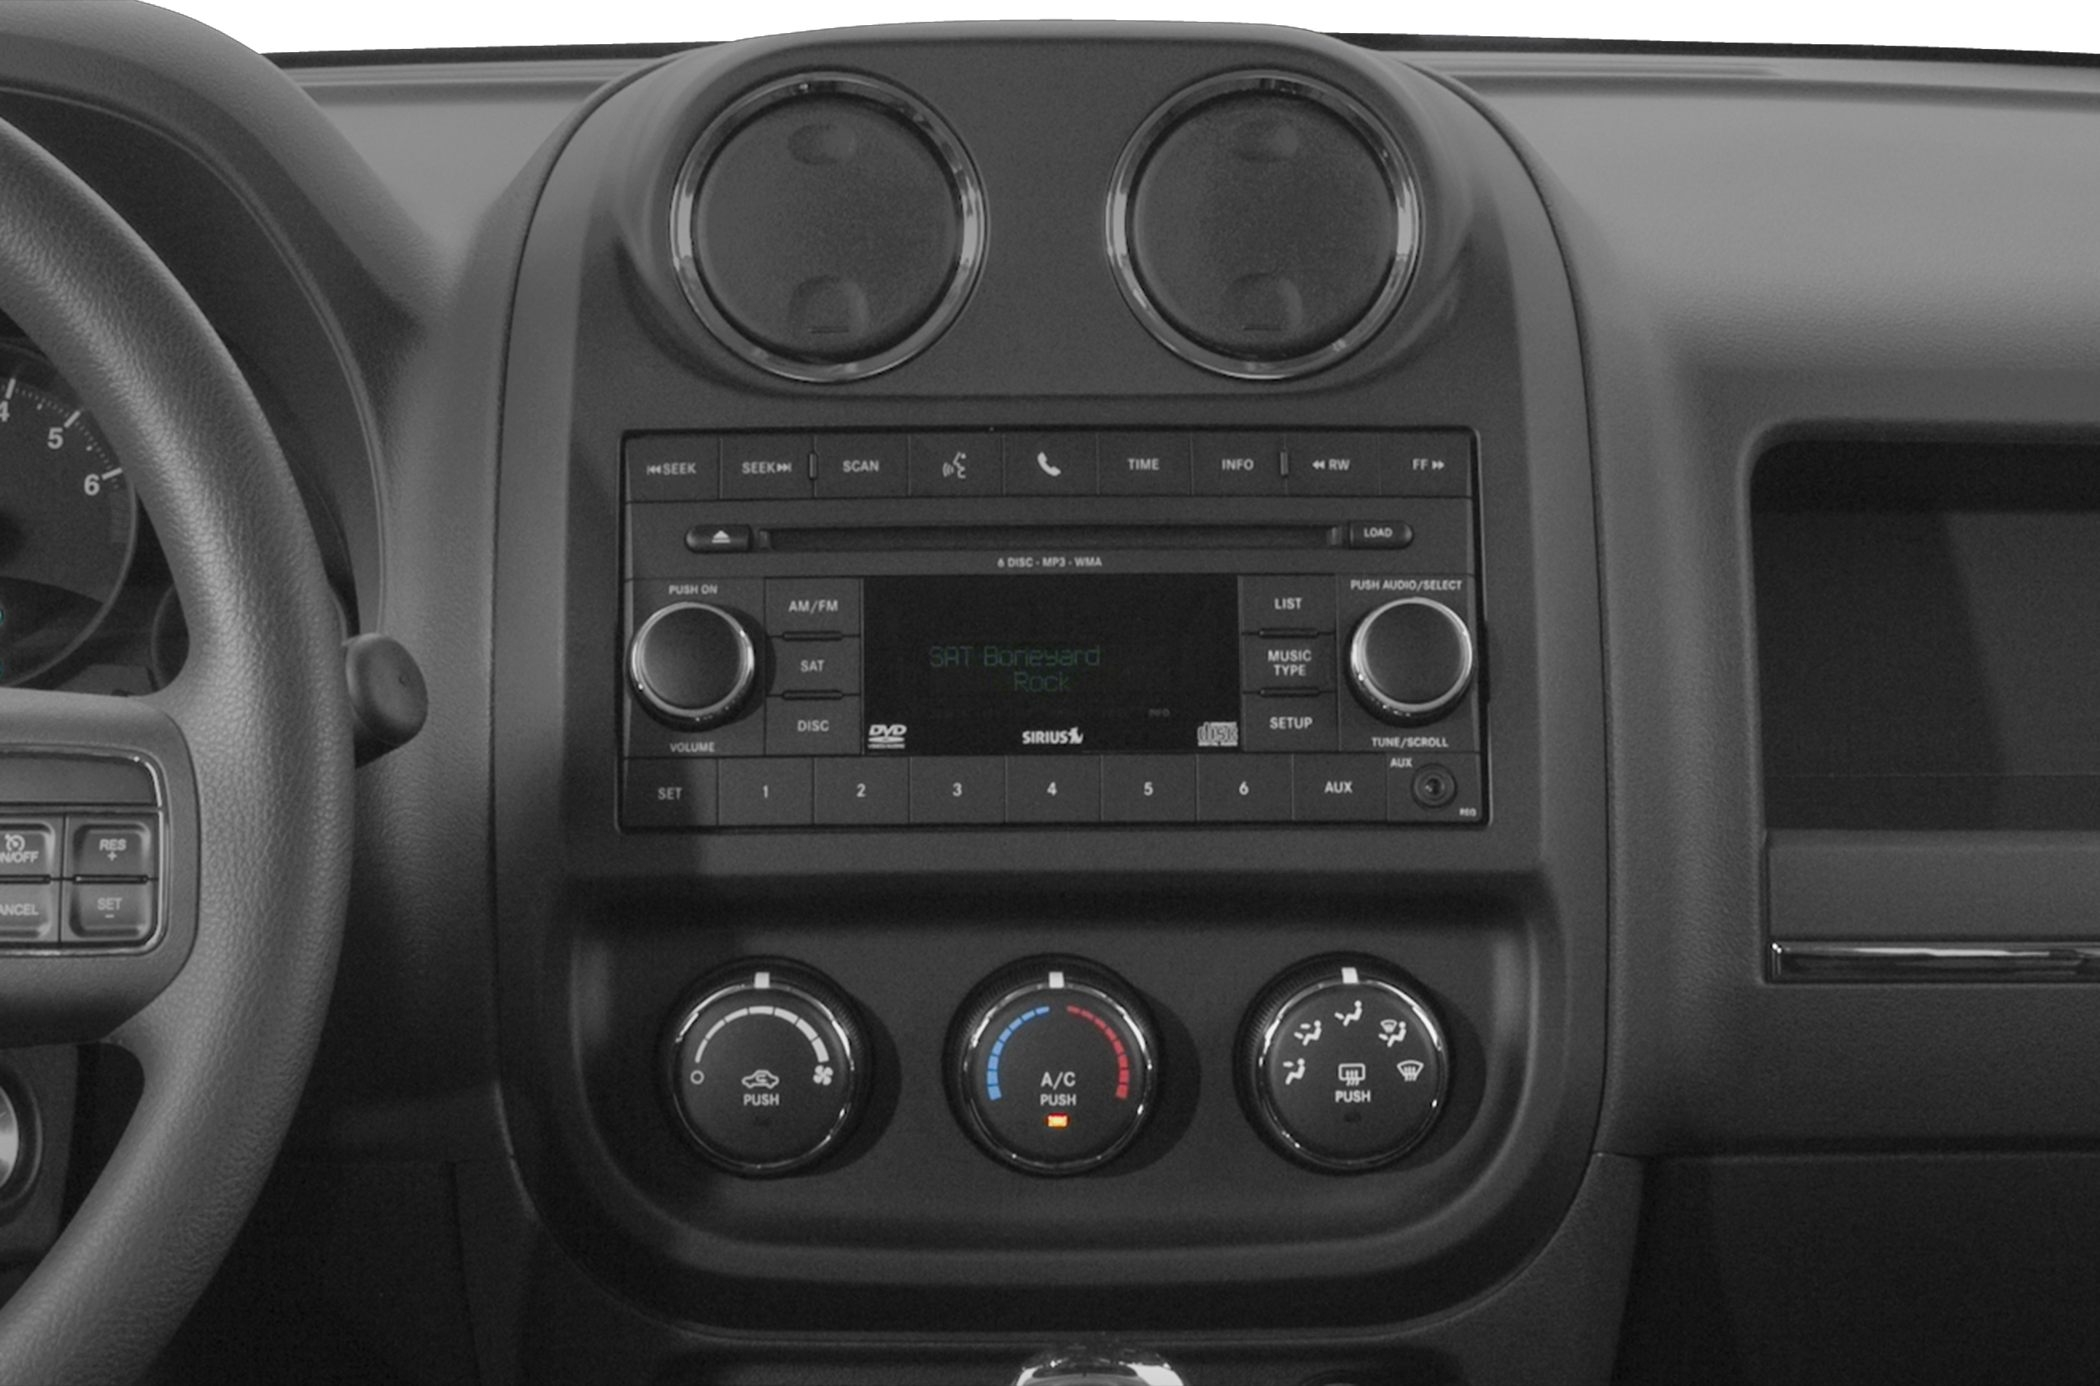 2015 jeep patriot price photos reviews amp features jeep patriot invoice price